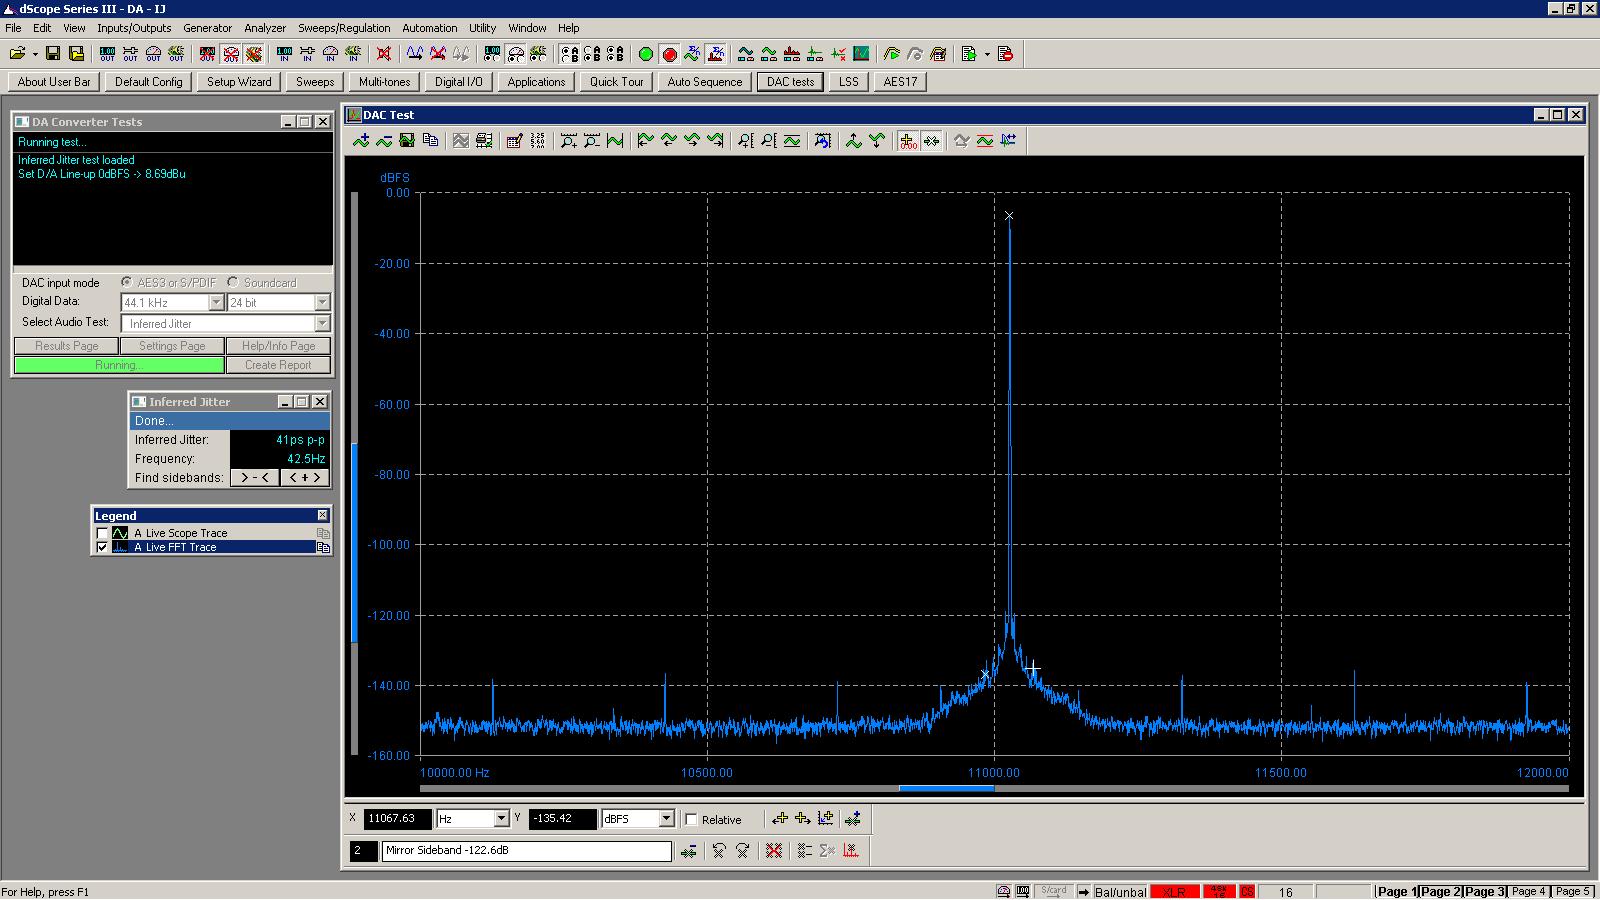 20160812 Modi MB inferred jitter - 2KHz BW - spdif.png